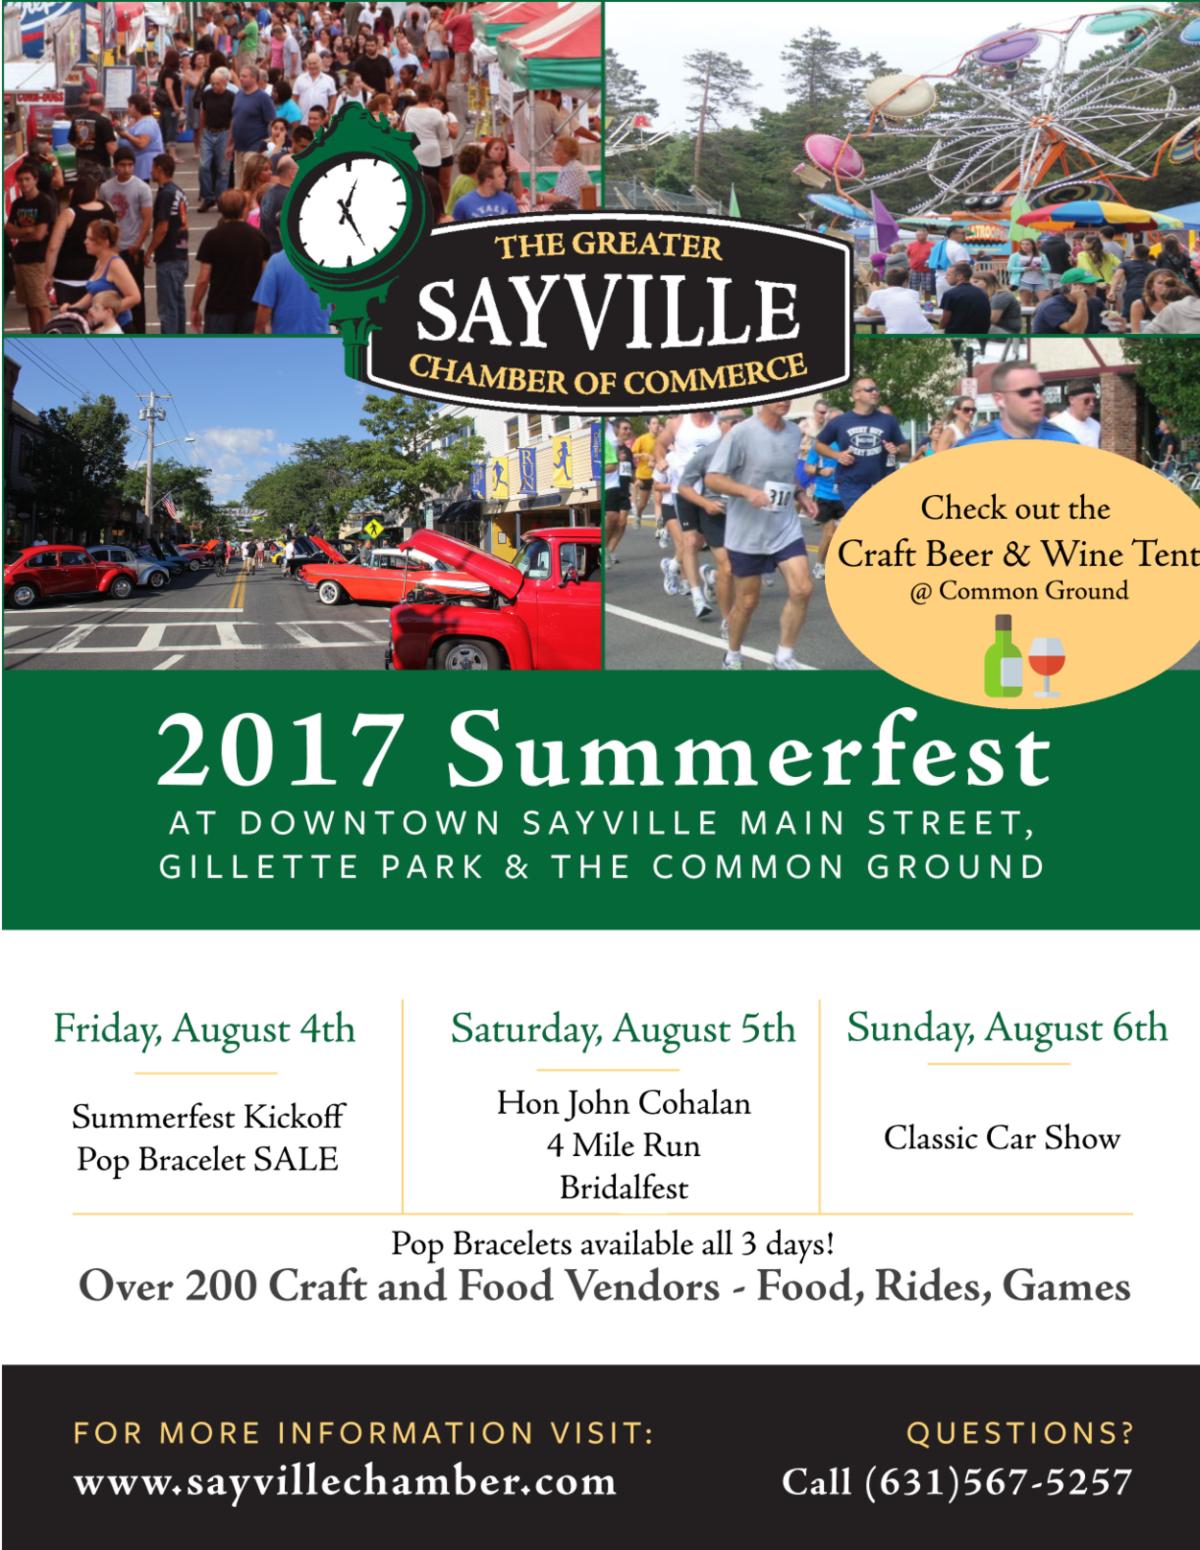 sayville men 100% free sayville dating & personals & women seeking men signup free & meet 1000s of sexy sayville, new york singles on bookofmatchescom.